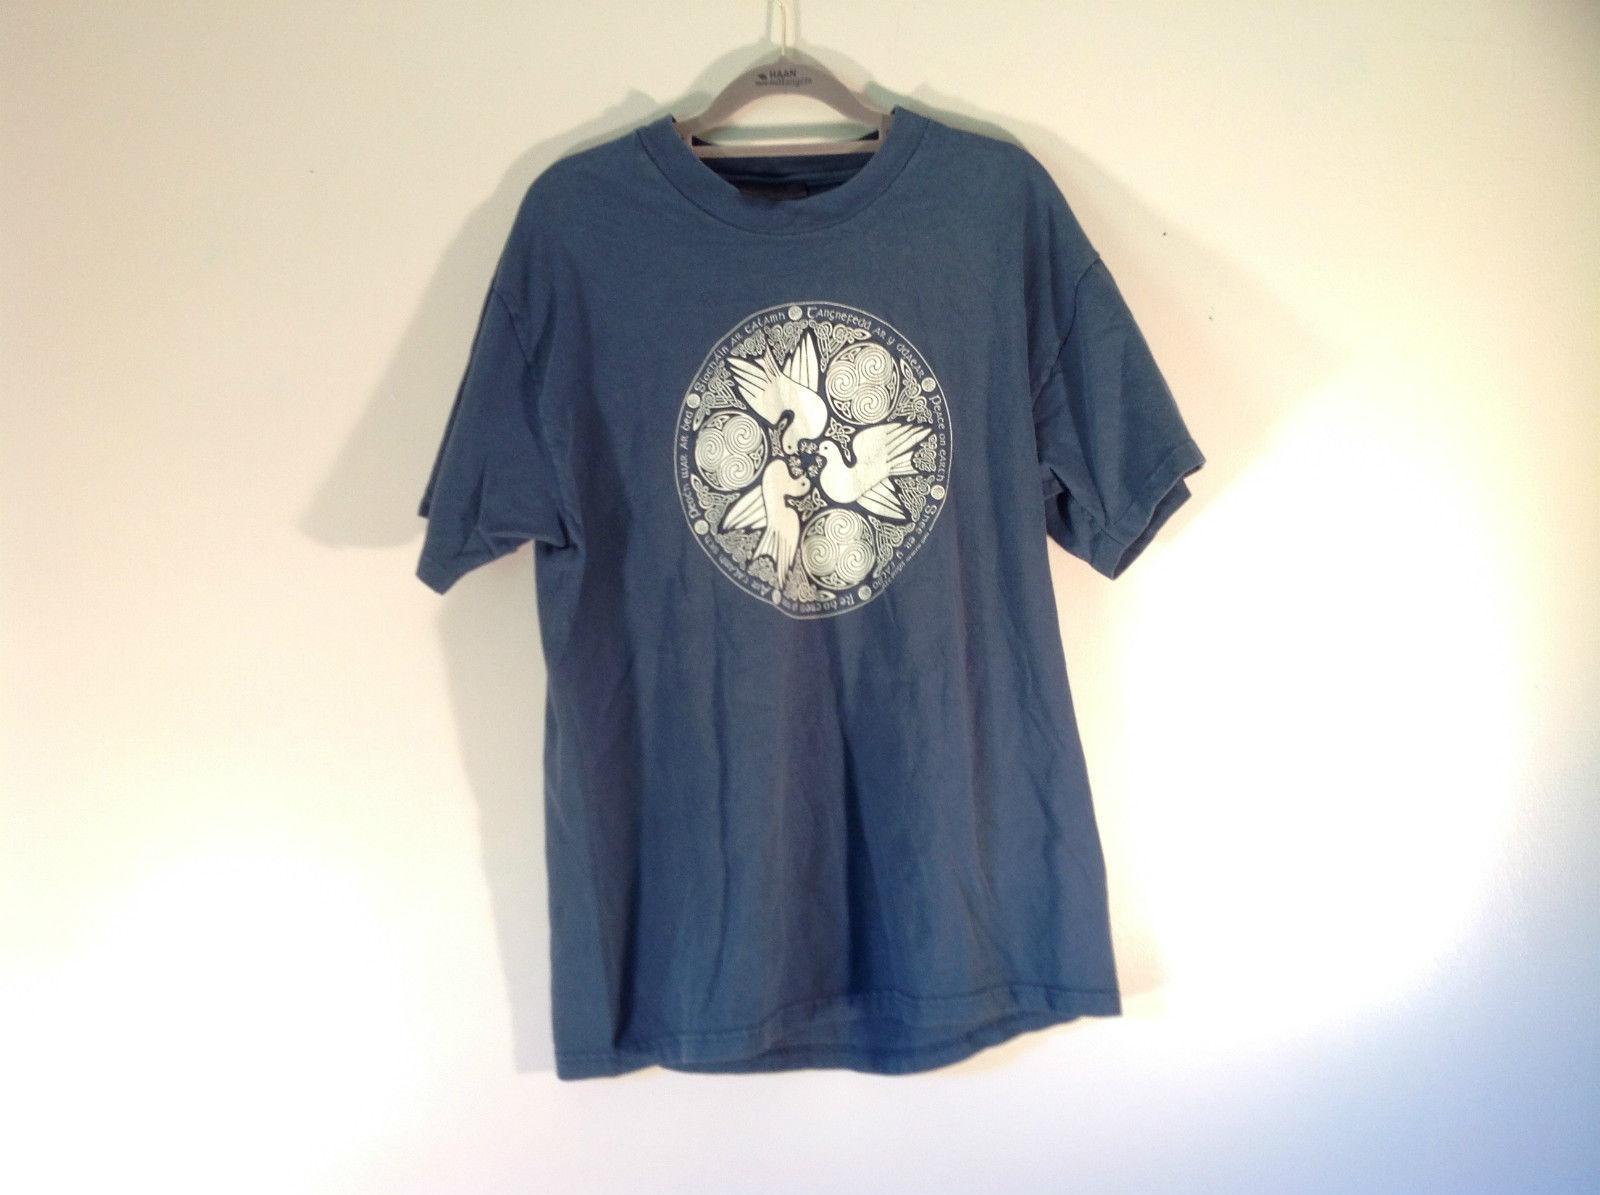 Keltic Designs Size L Short Sleeve Teal T Shirt 100 Percent Cotton White Birds